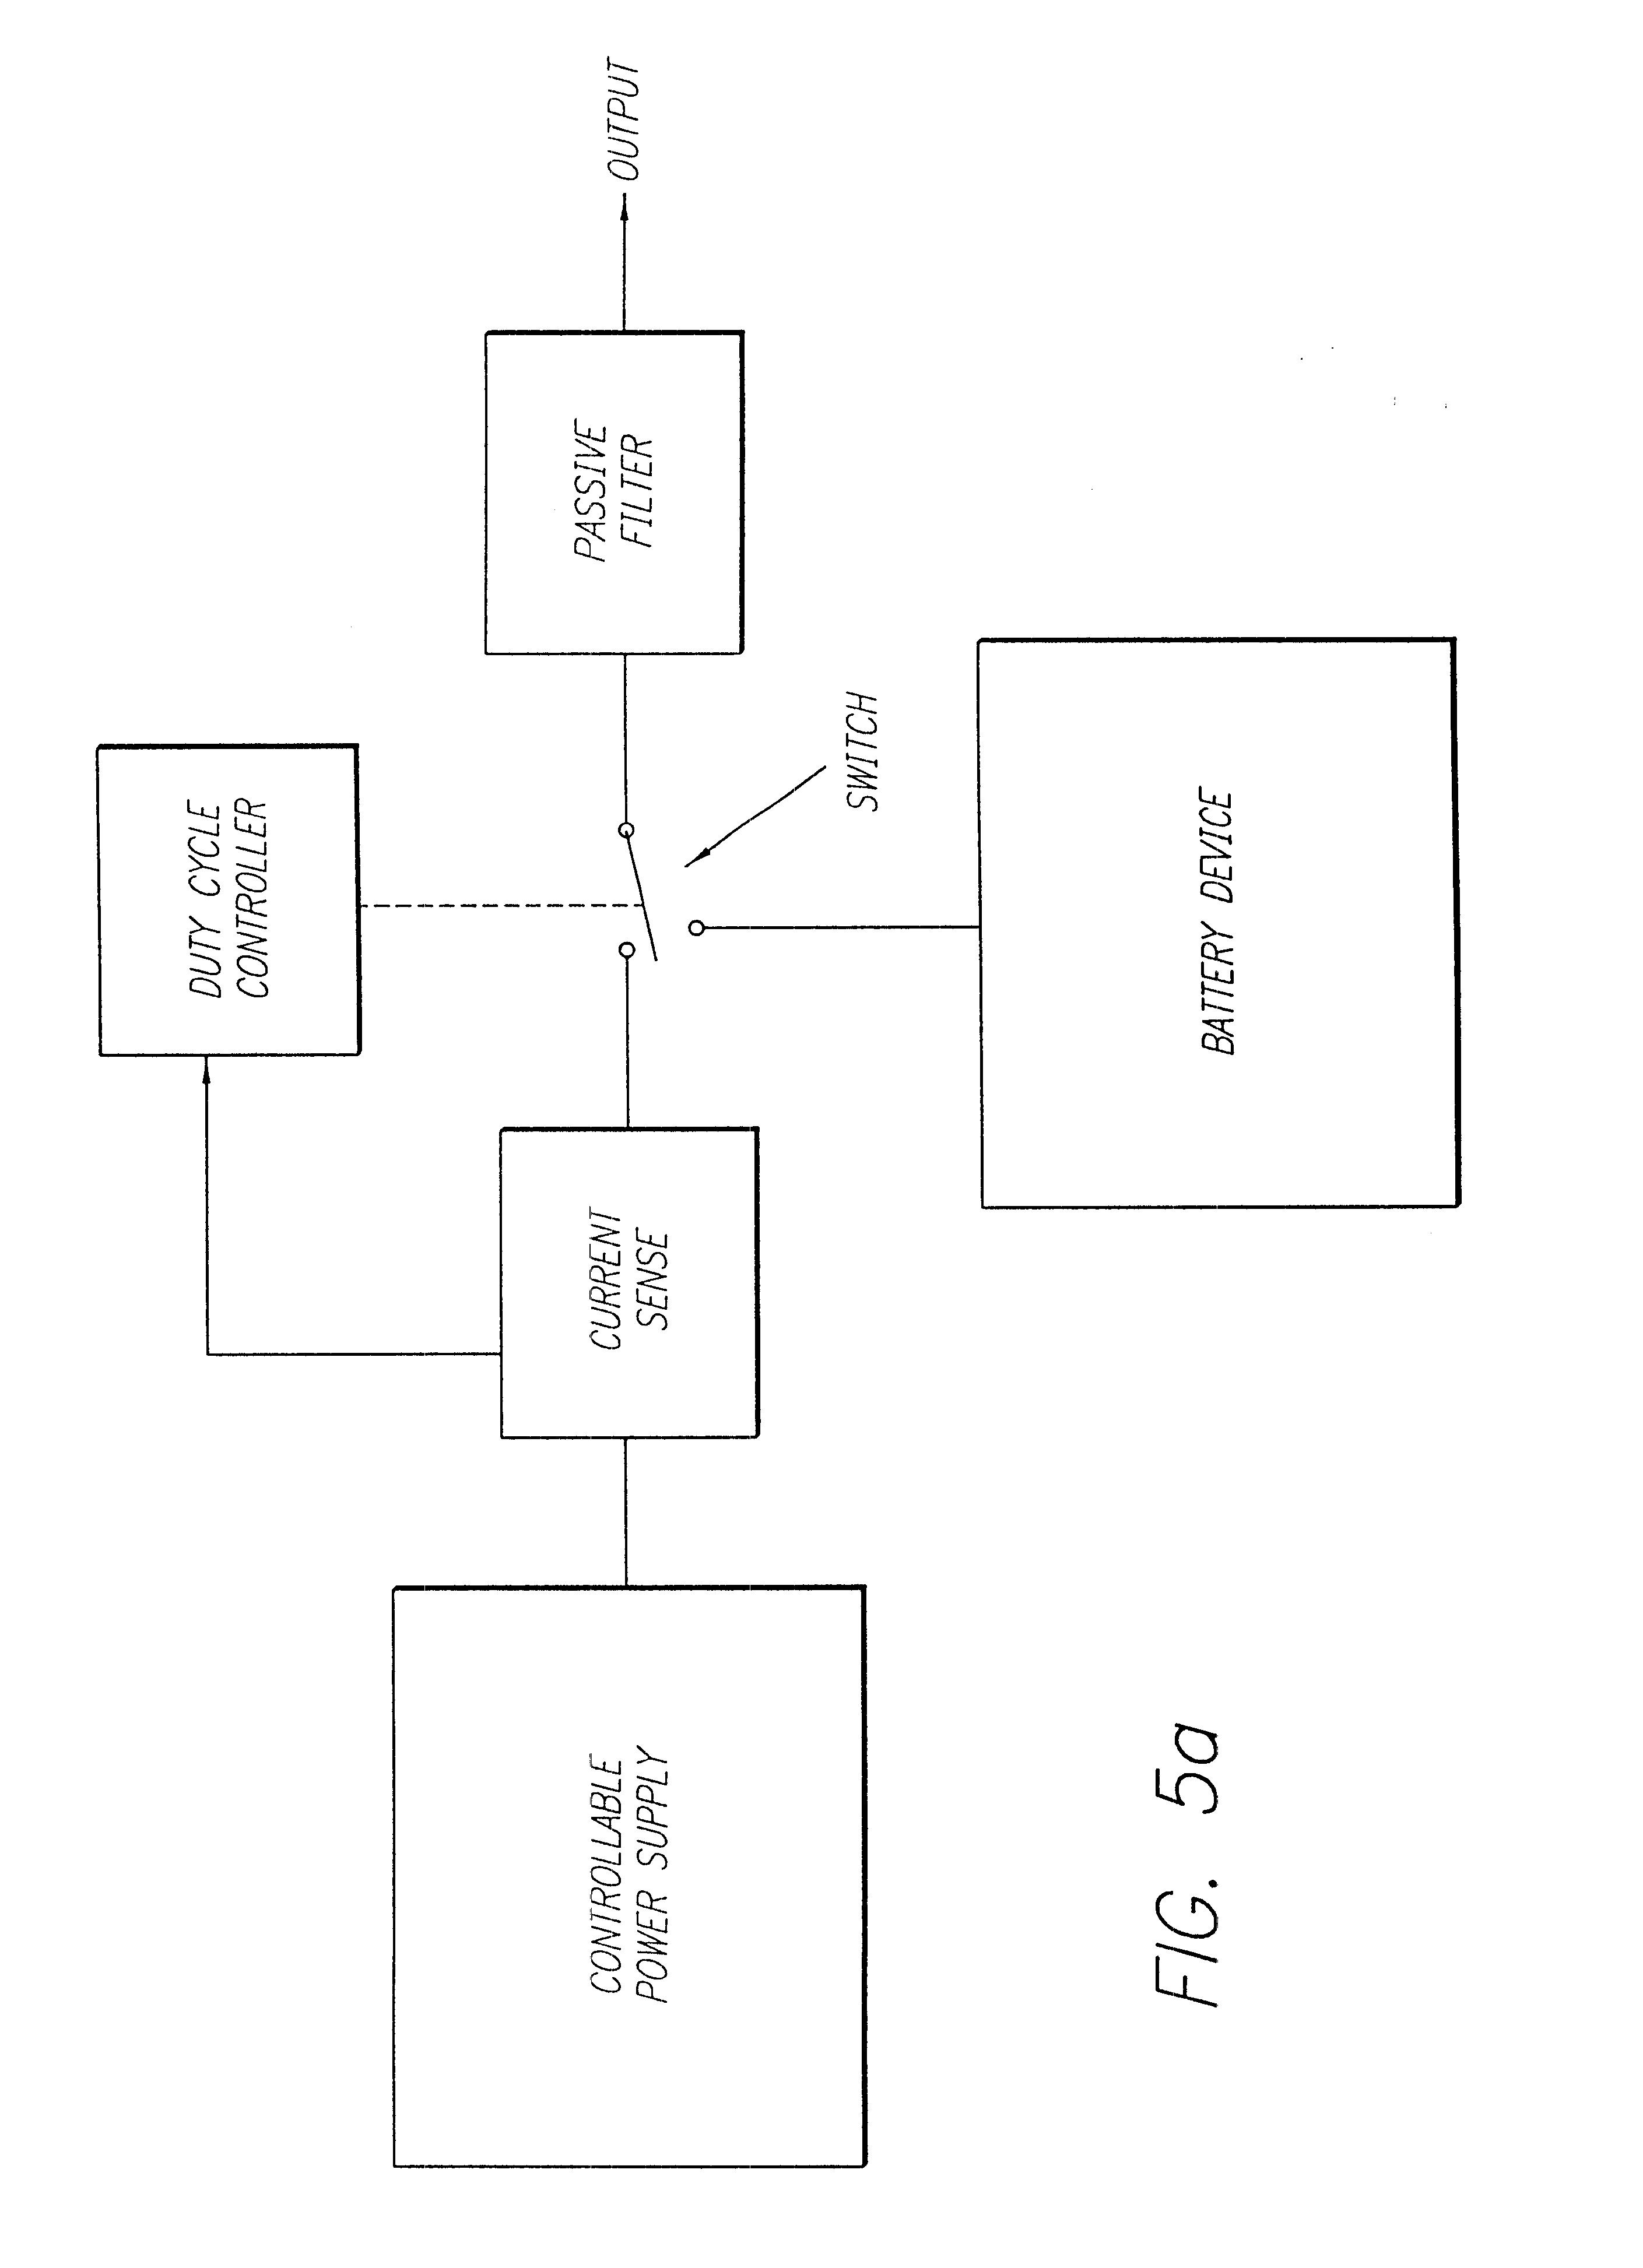 US06459175 20021001 D00006 patent us6459175 universal power supply google patents universal power supply circuit diagram at edmiracle.co